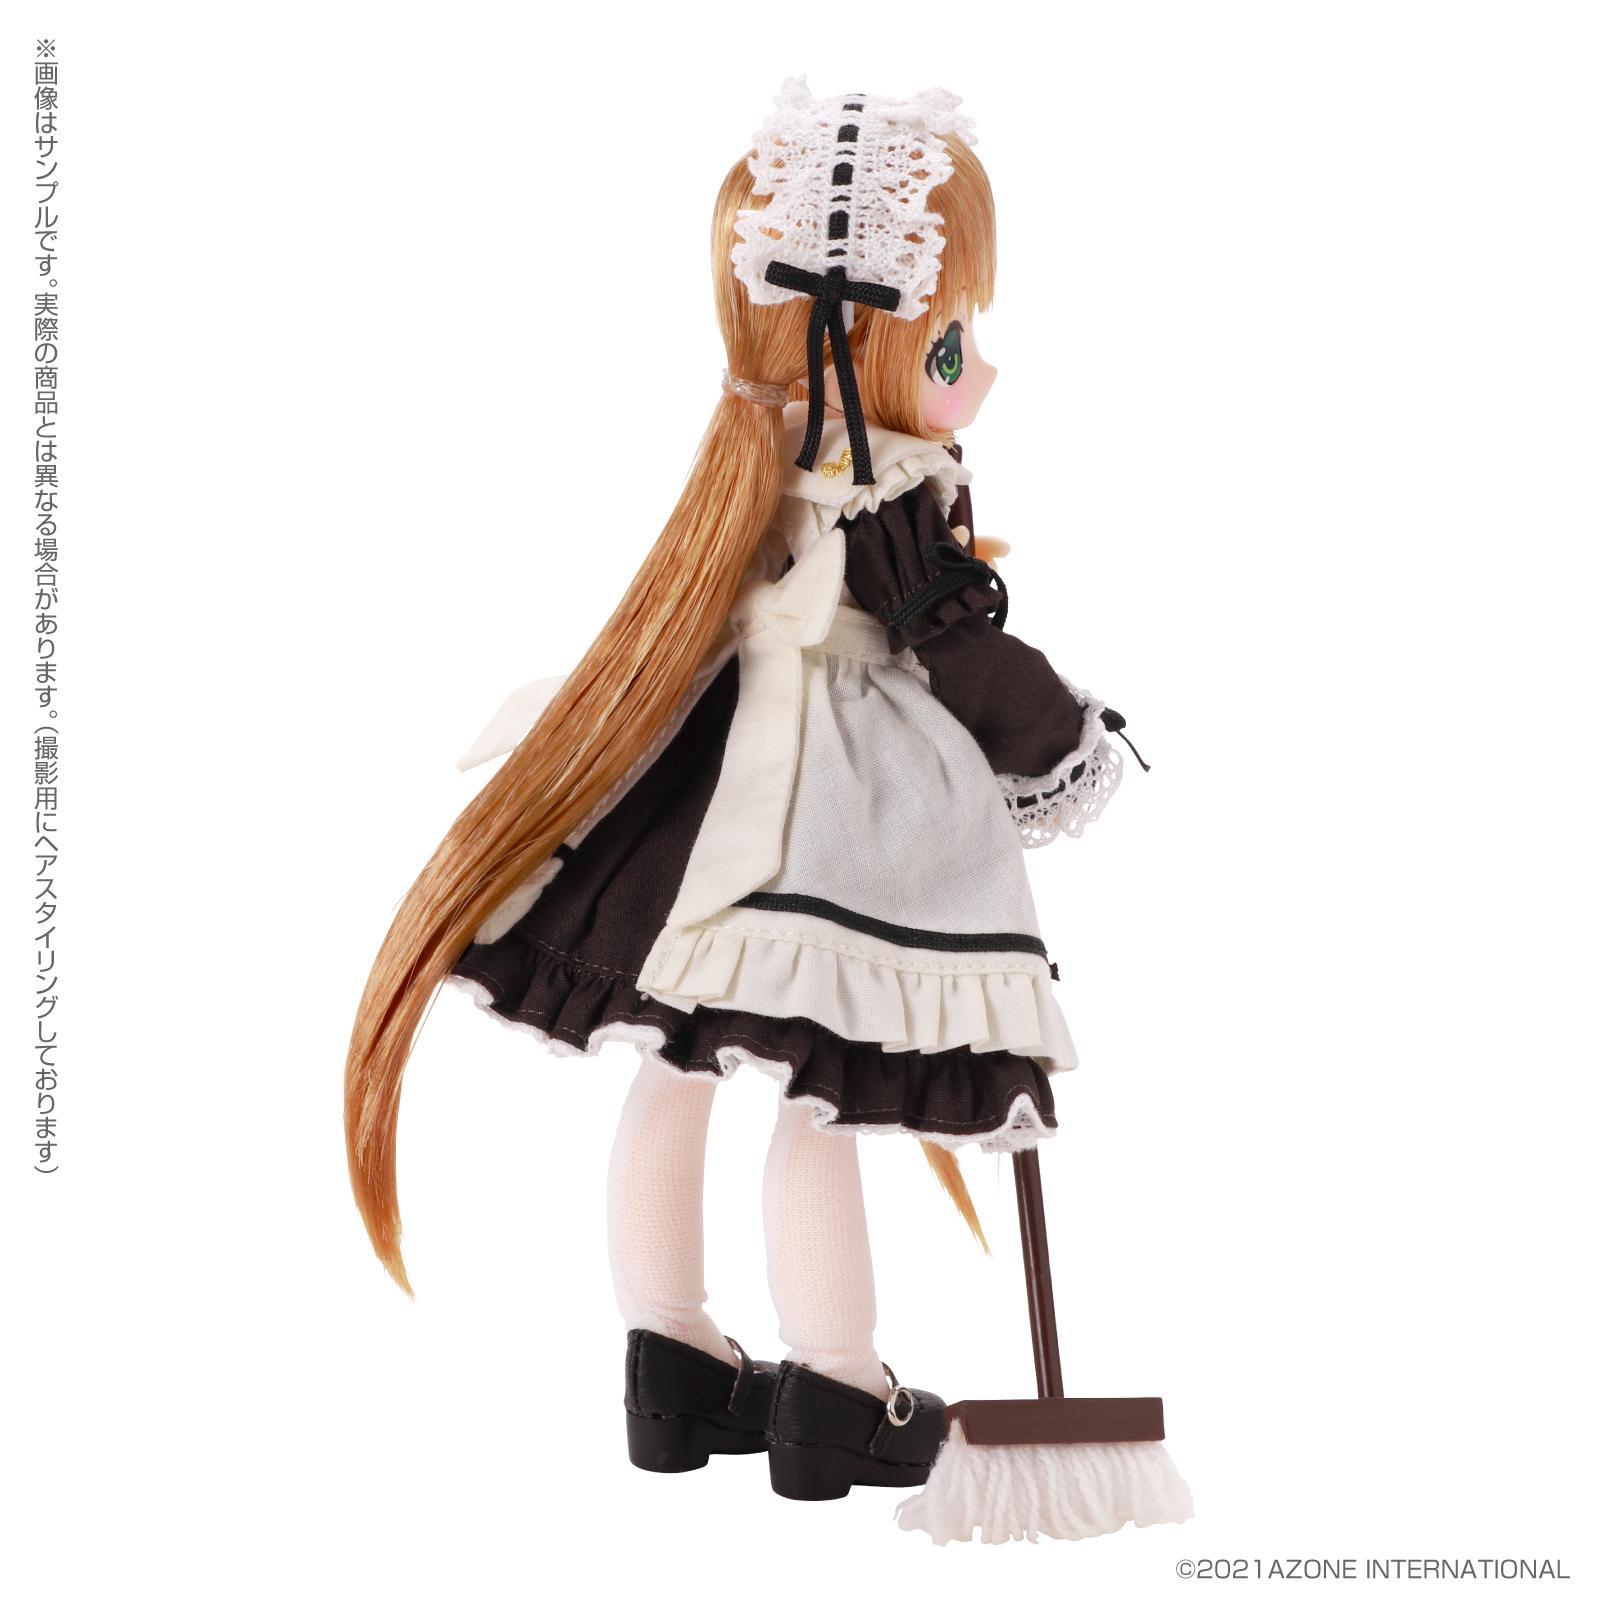 Lil'Fairy ~ちいさなお手伝いさん~『リプー 7th anniv.(ノーマル口ver.)』1/12 完成品ドール-008